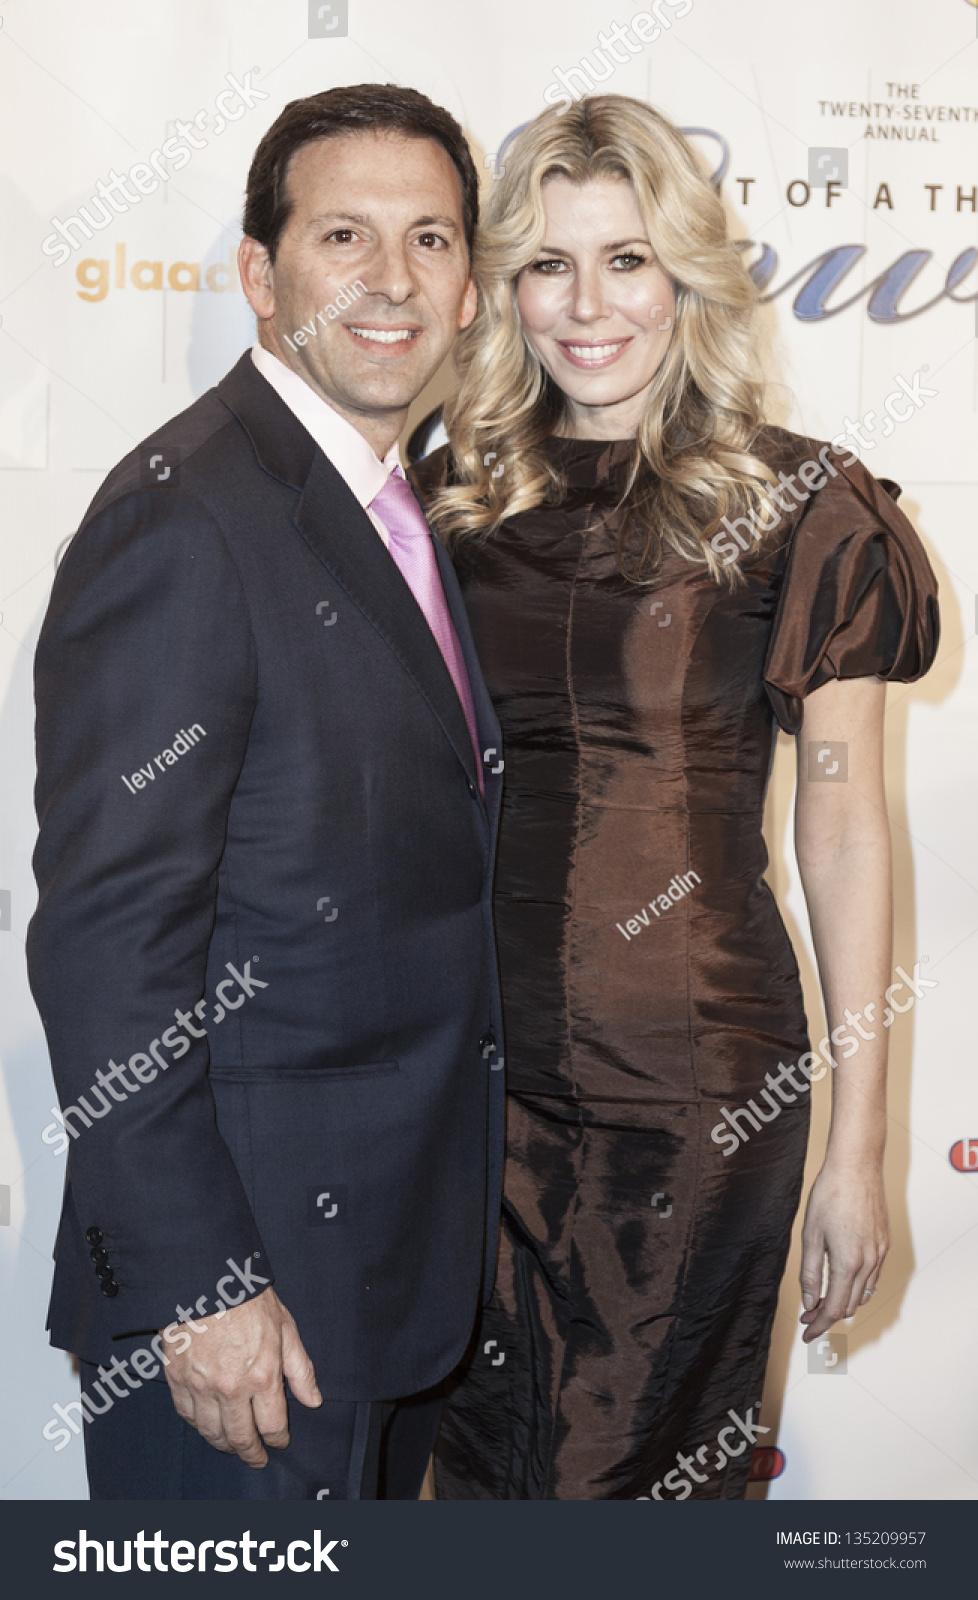 NEW YORK - APRIL 06: Aviva and Reid Drescher attend the 27th Annual ...